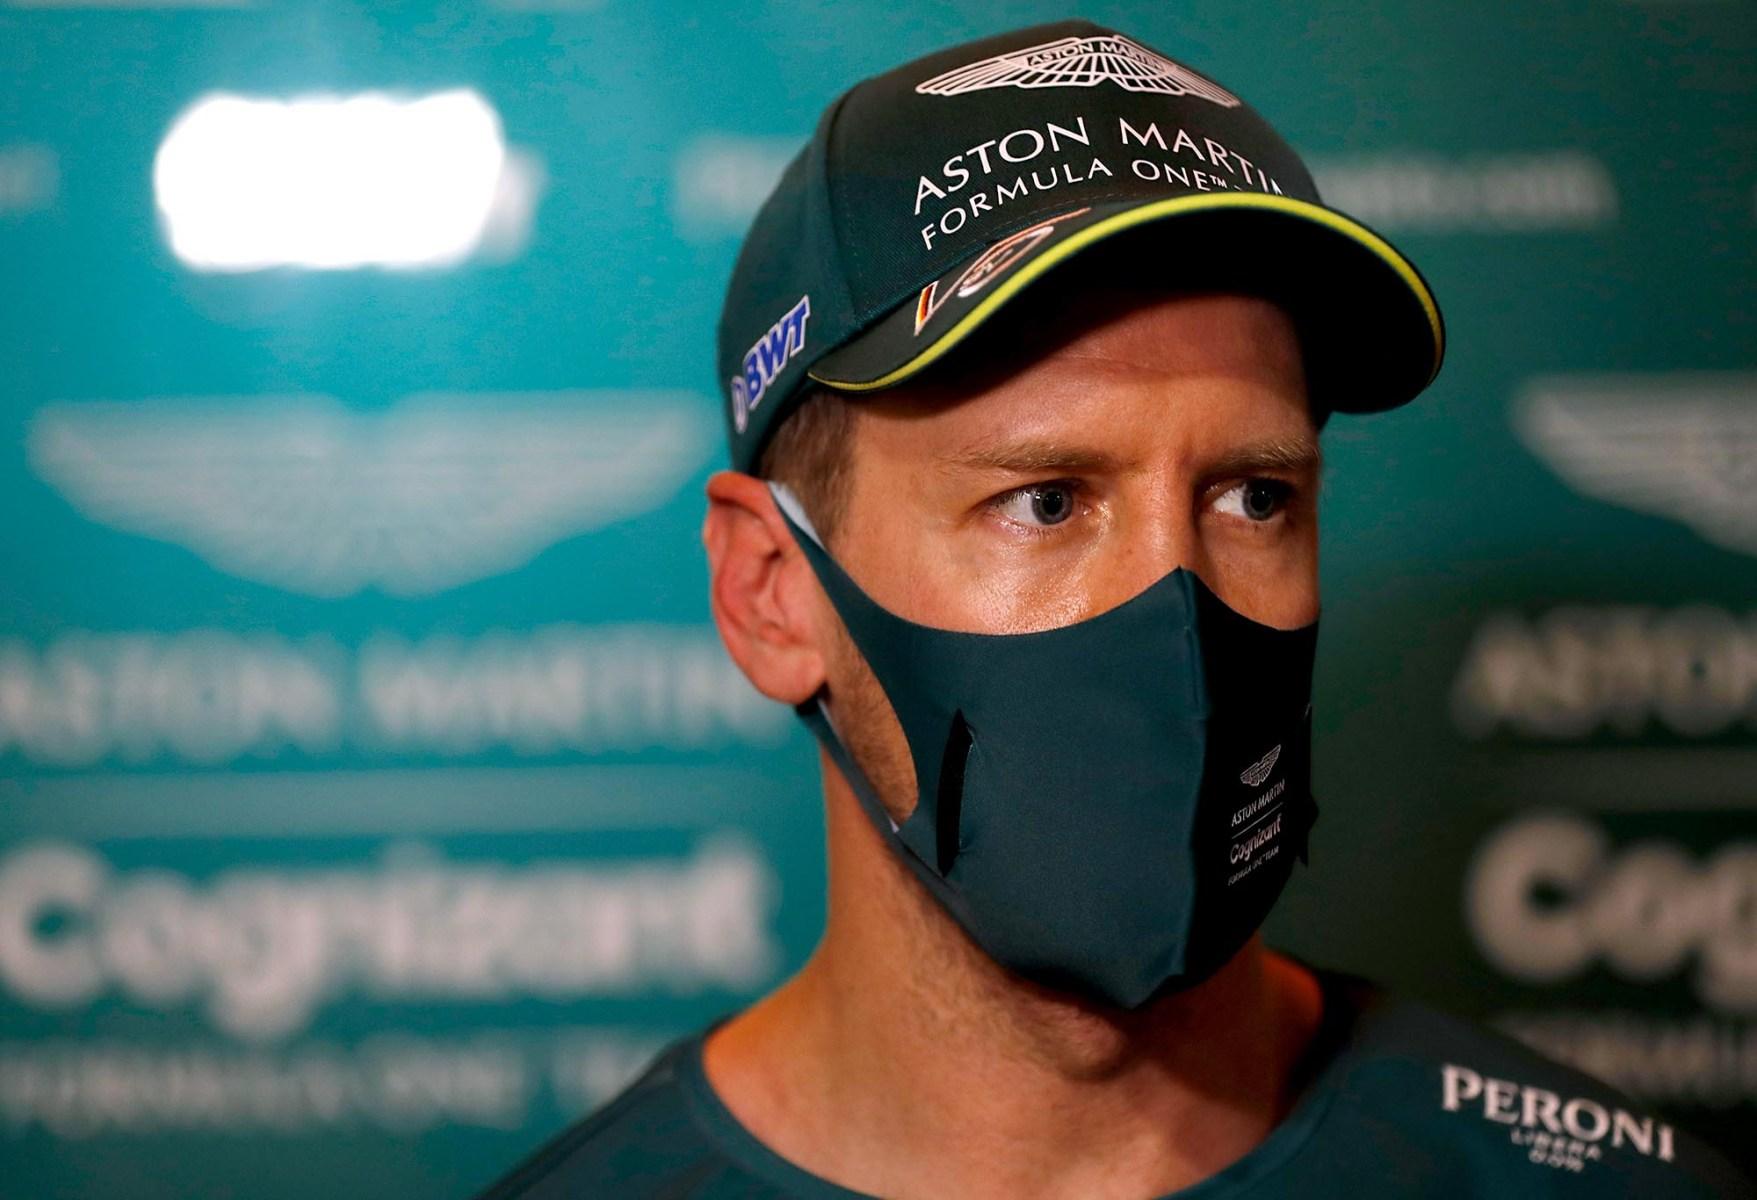 Sebastian Vettel looks on while wearing a mask